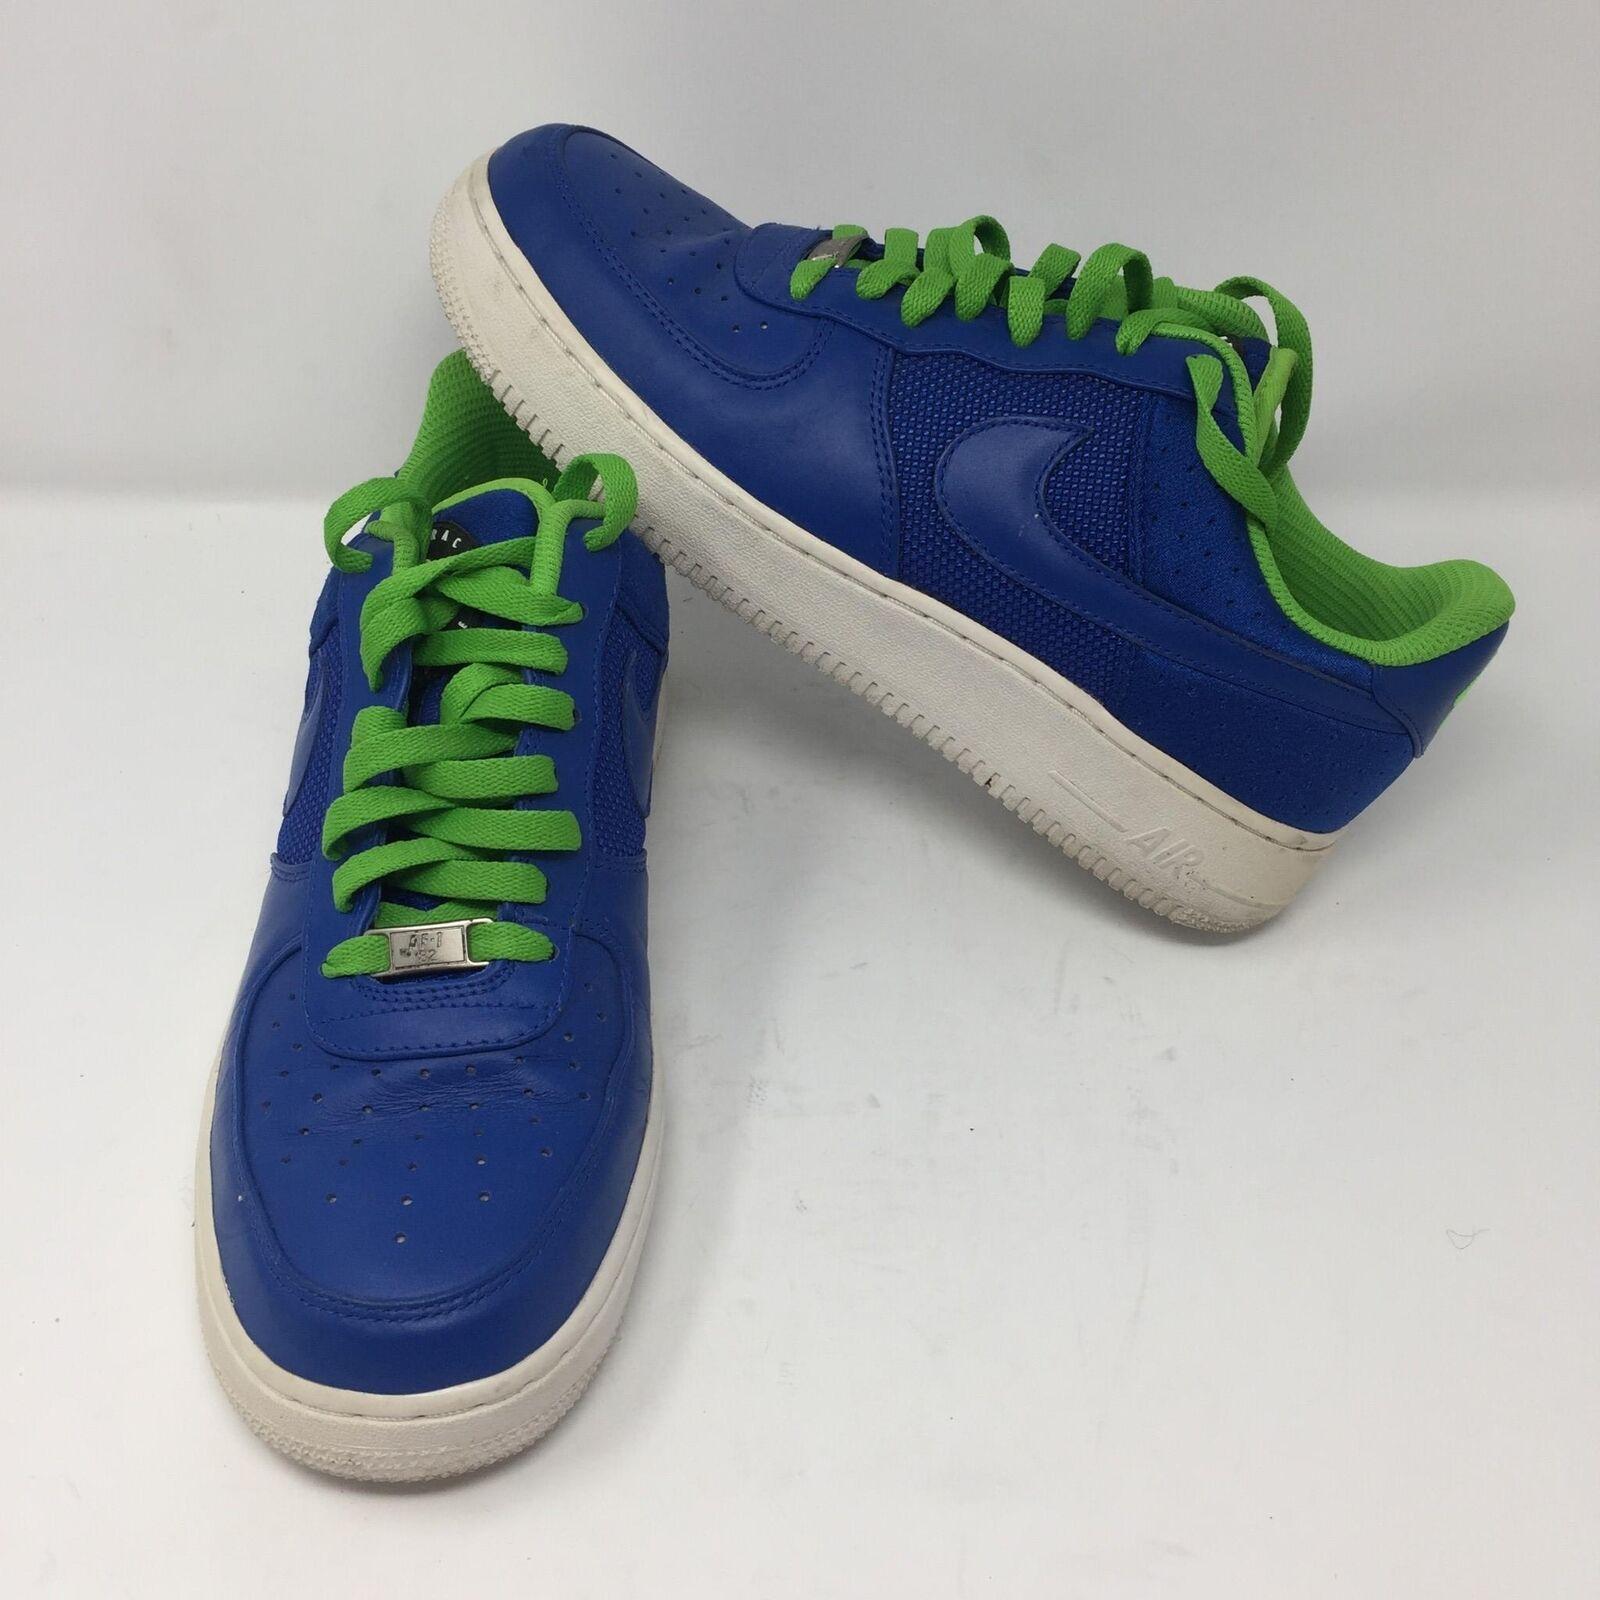 brand new 991b1 4b16c Nike Nike Nike Air Force 1 Canvas bluee Neon Green Mens shoes Sz 9 354716-